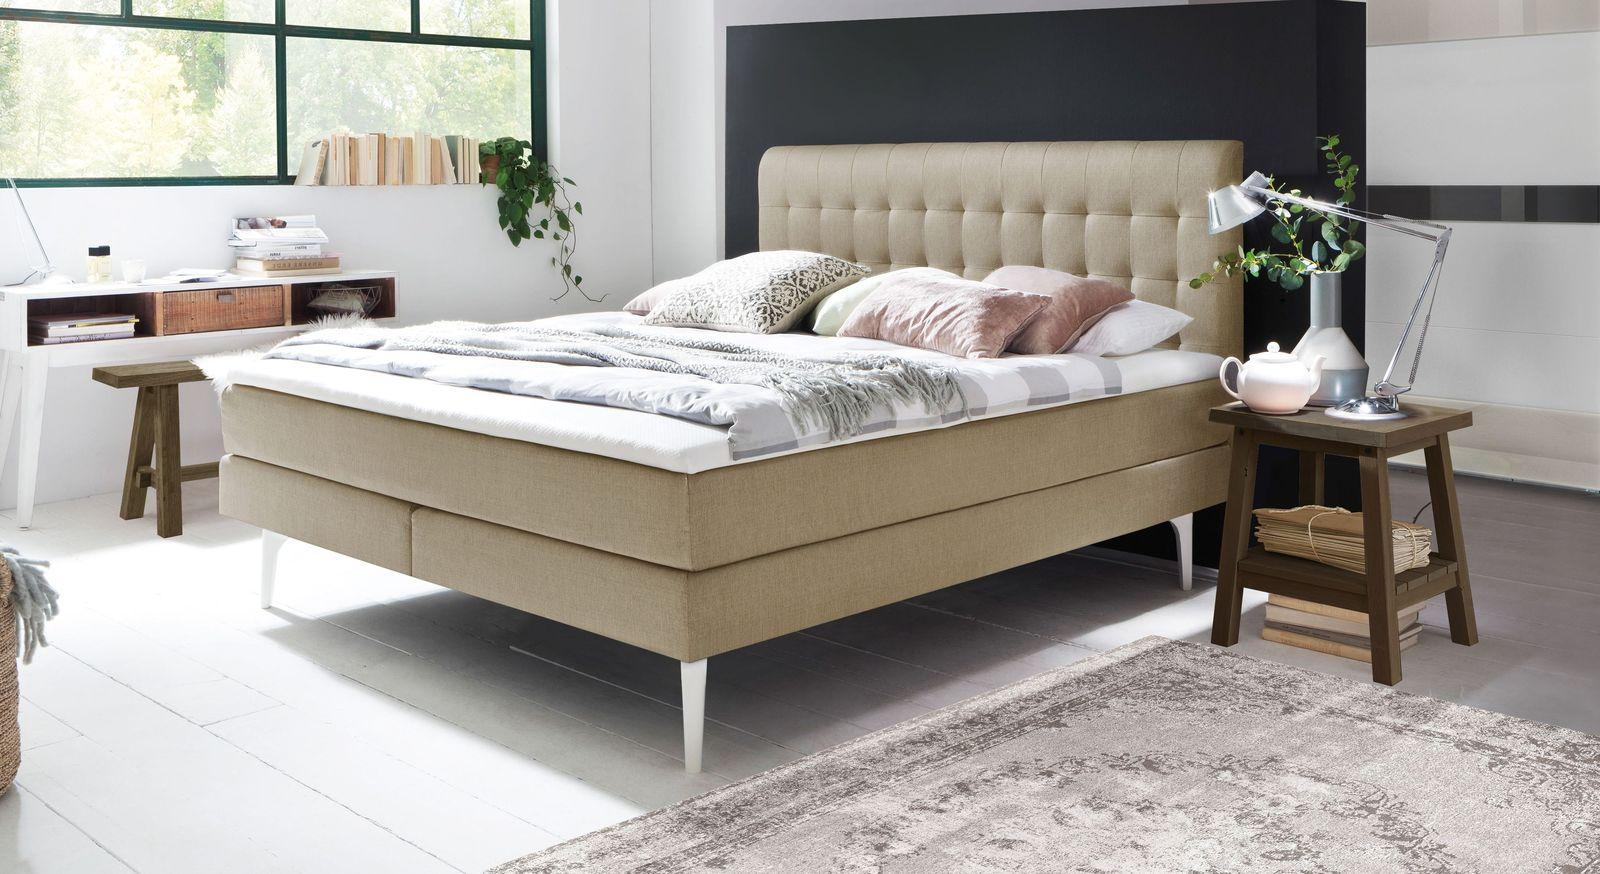 Elegantes Boxspringbett Tromello mit hohen Bettbeinen